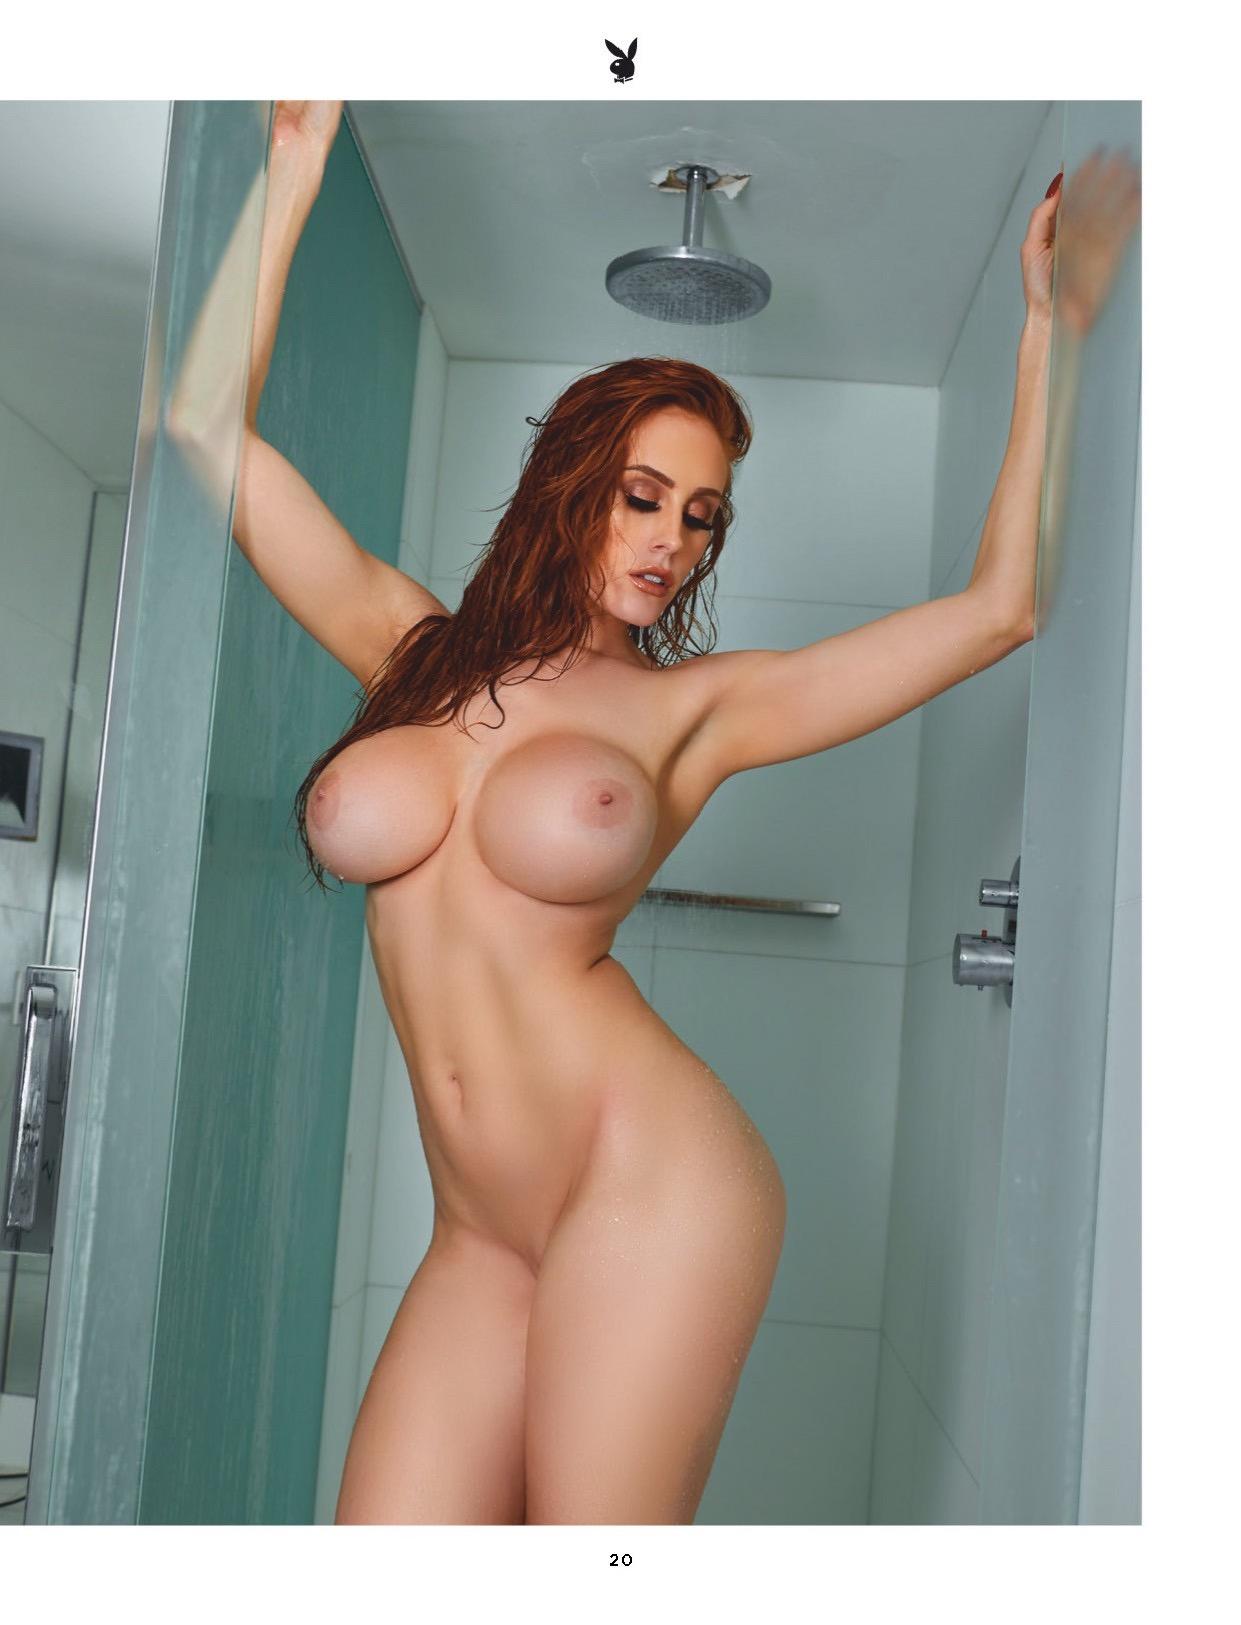 Faith Nicole Reynolds Nude - VoyeurFlash.com